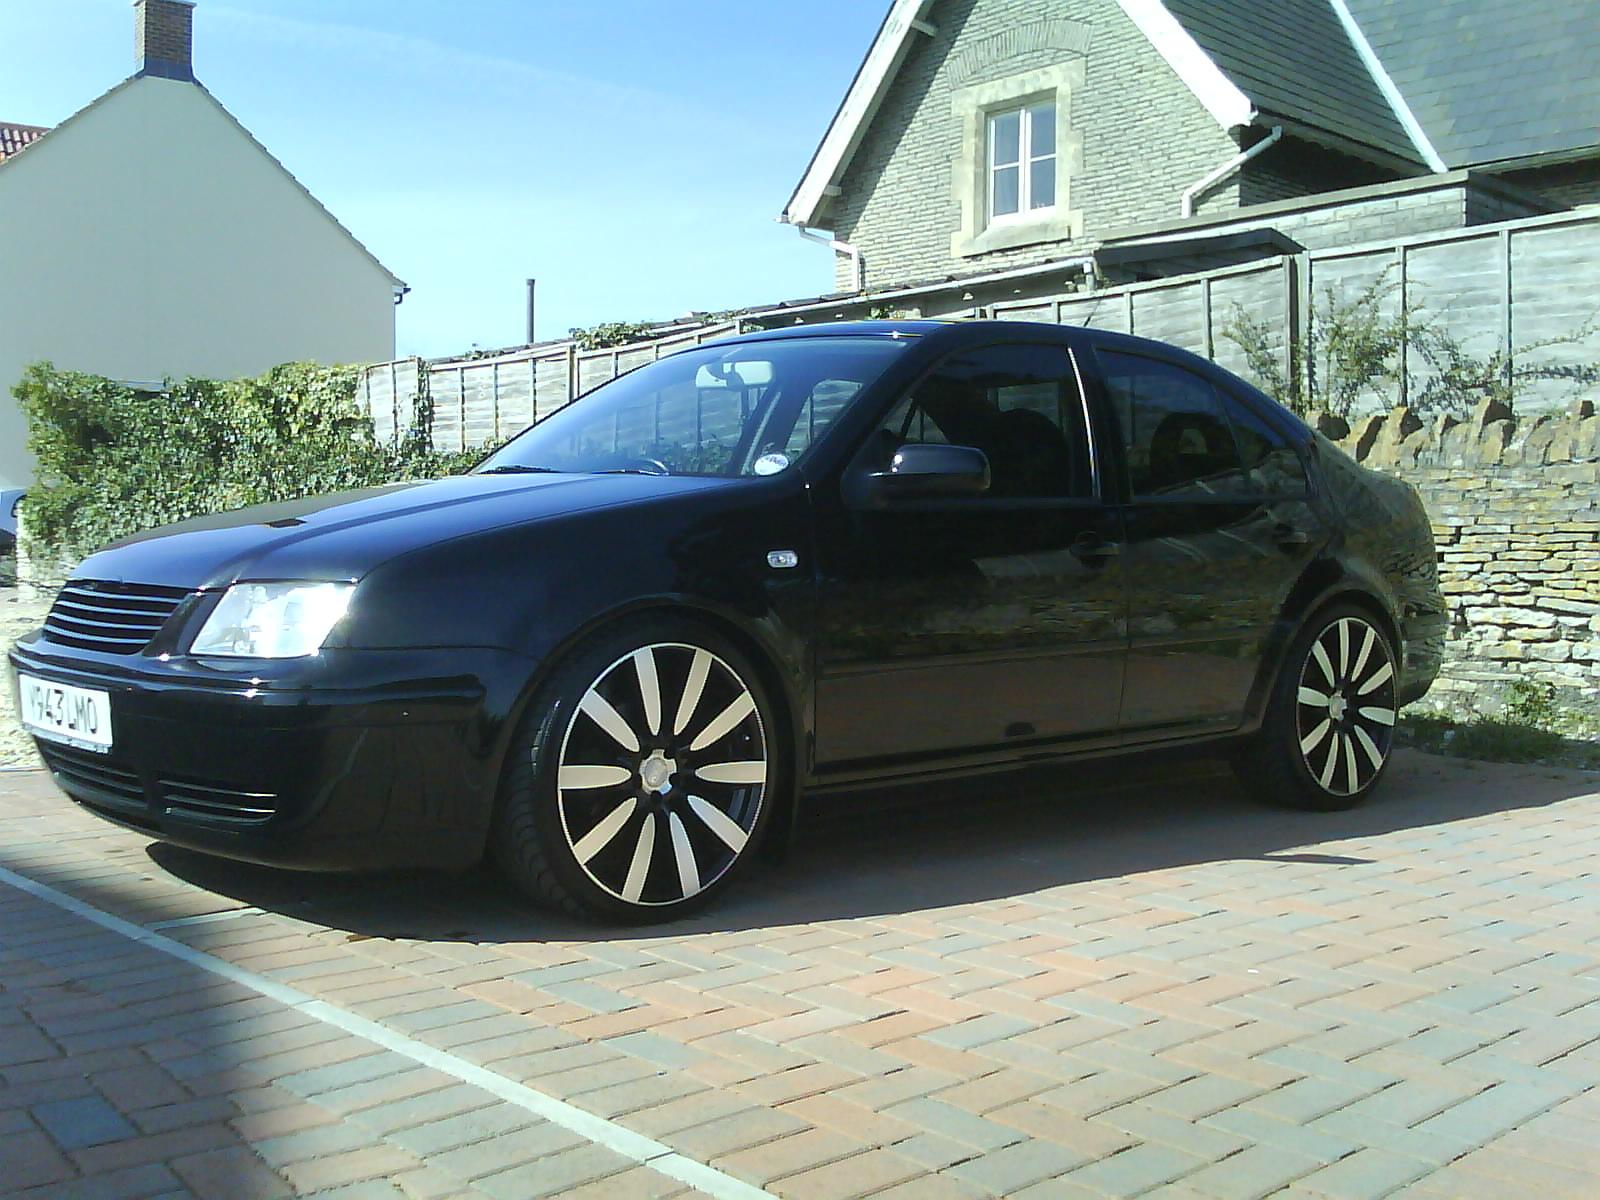 2001 Volkswagen Bora Pictures Cargurus